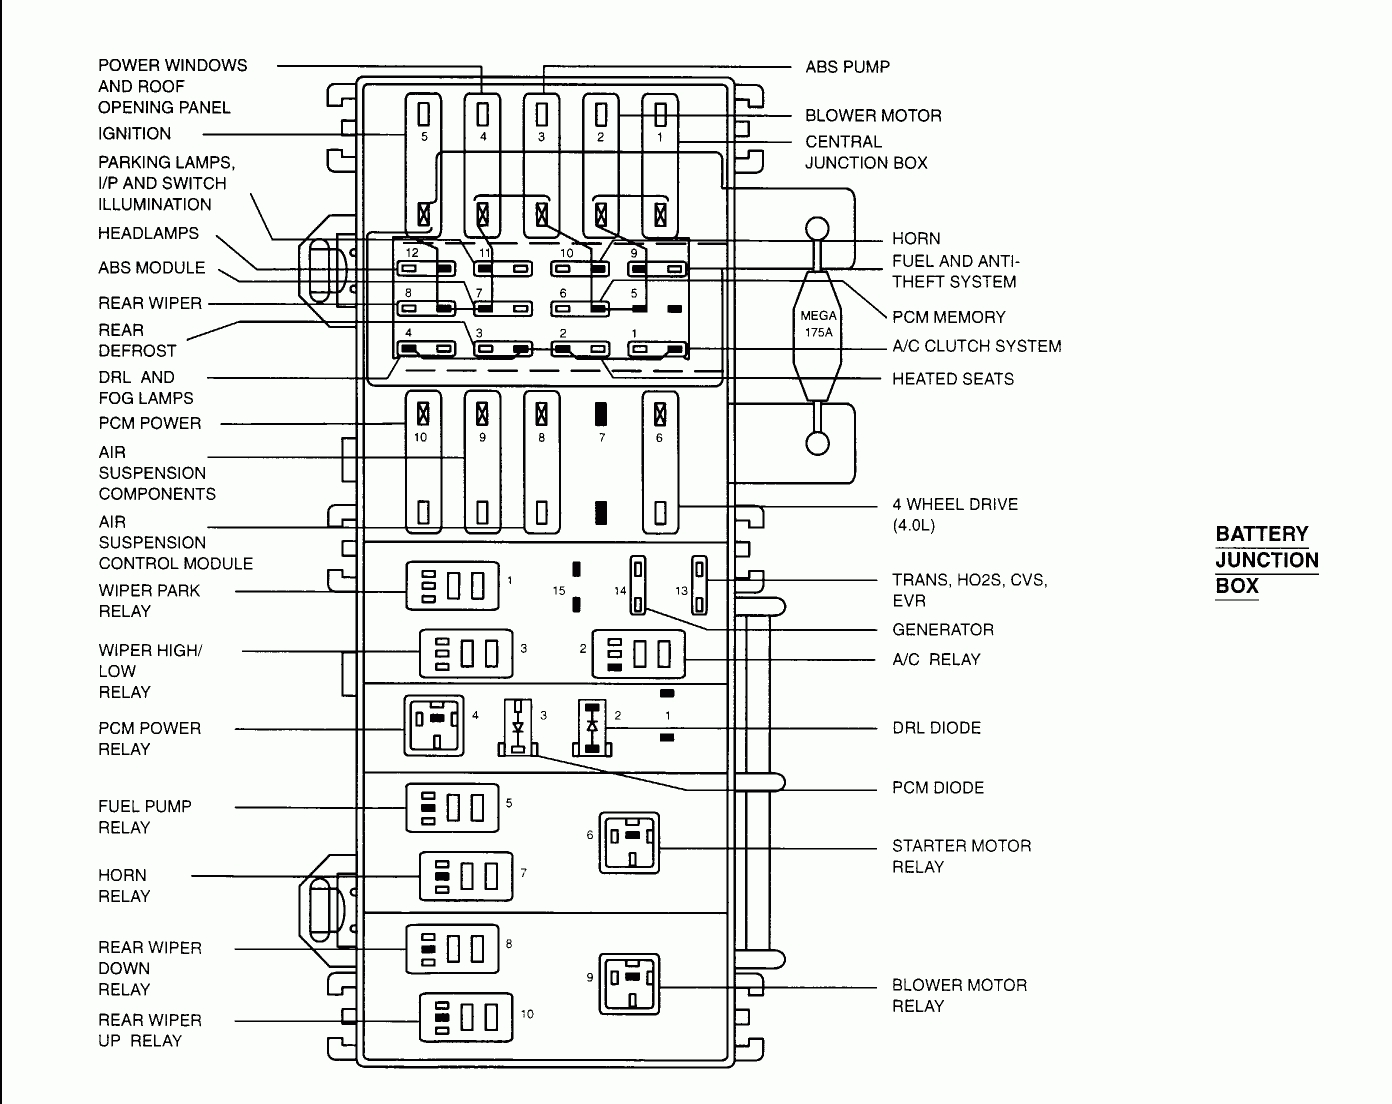 1995 ford explorer fuse diagram 1999 explorer fuse diagram wiring diagram data  1999 explorer fuse diagram wiring